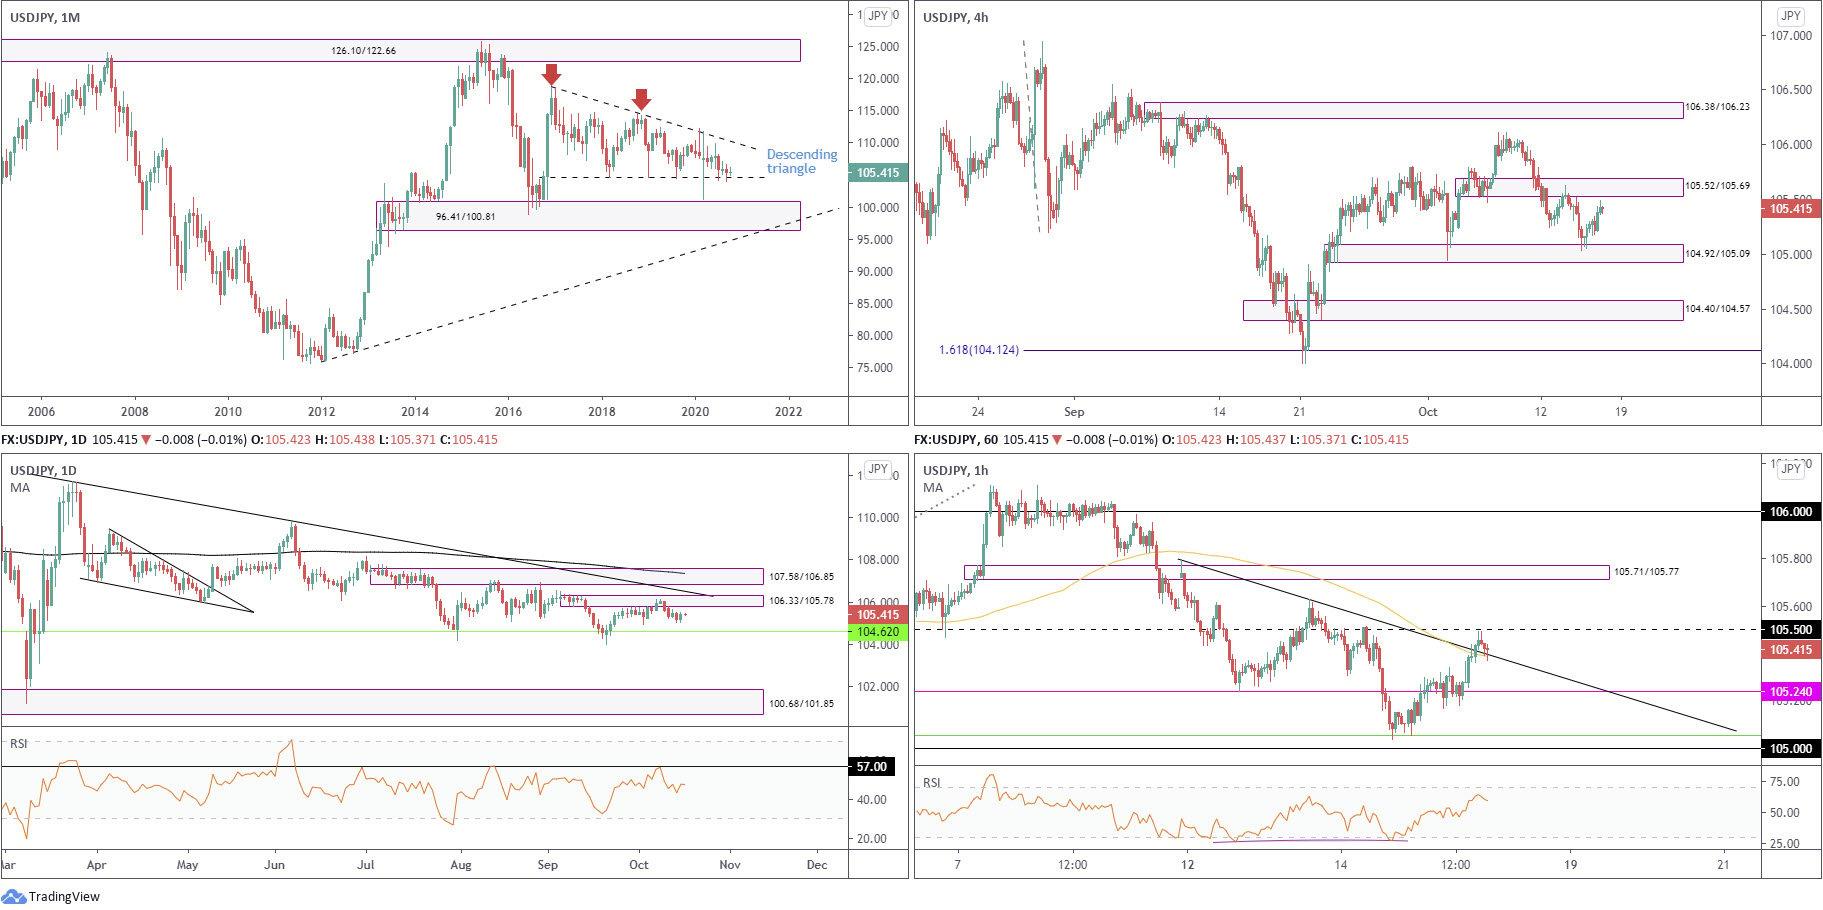 October 16th 2020: DXY Engulfs 93.50 – Bid Amid Risk Aversion, FP Markets